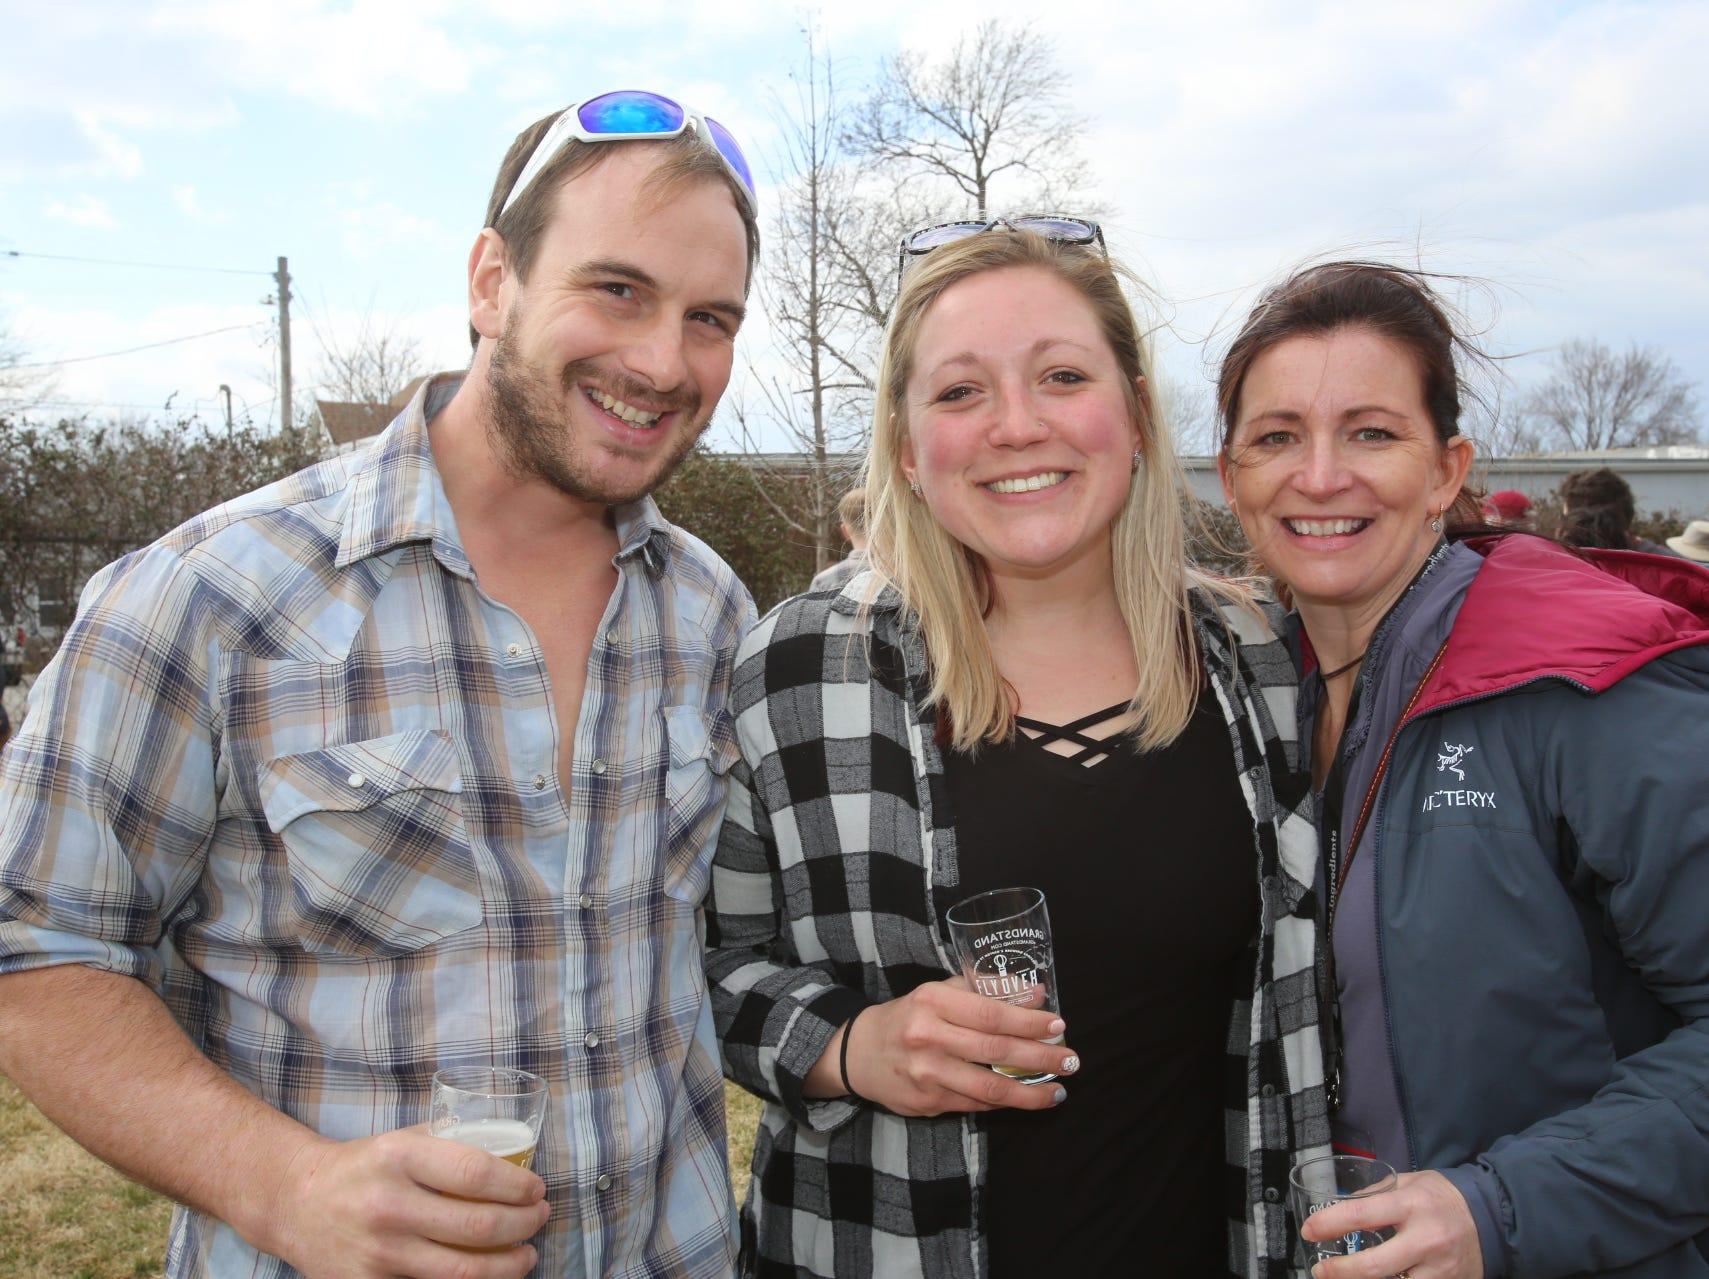 Tom and Nikki Schmitt and Amy Lahue